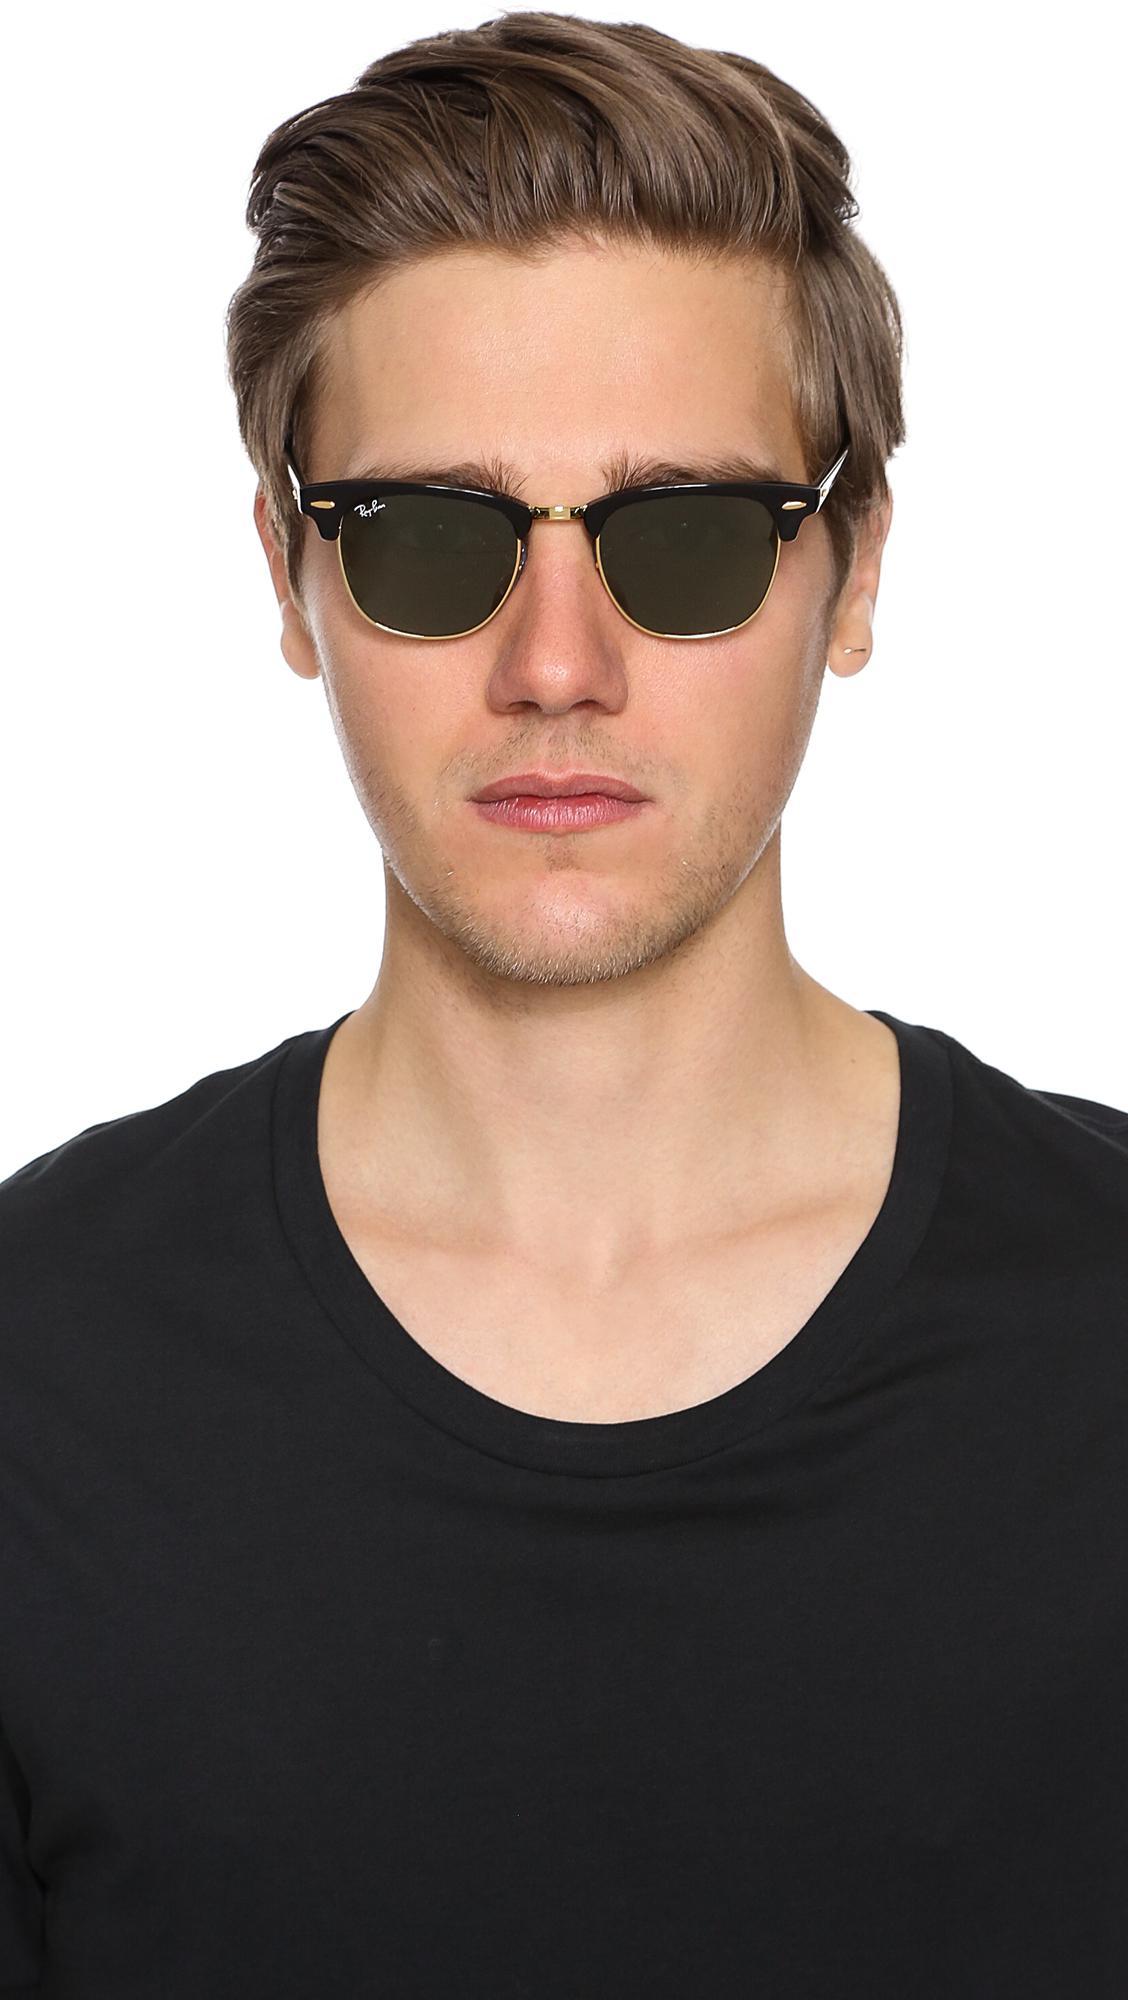 c2eaadf784 Ray-Ban - Black Clubmaster Classic Sunglasses for Men - Lyst. View  fullscreen